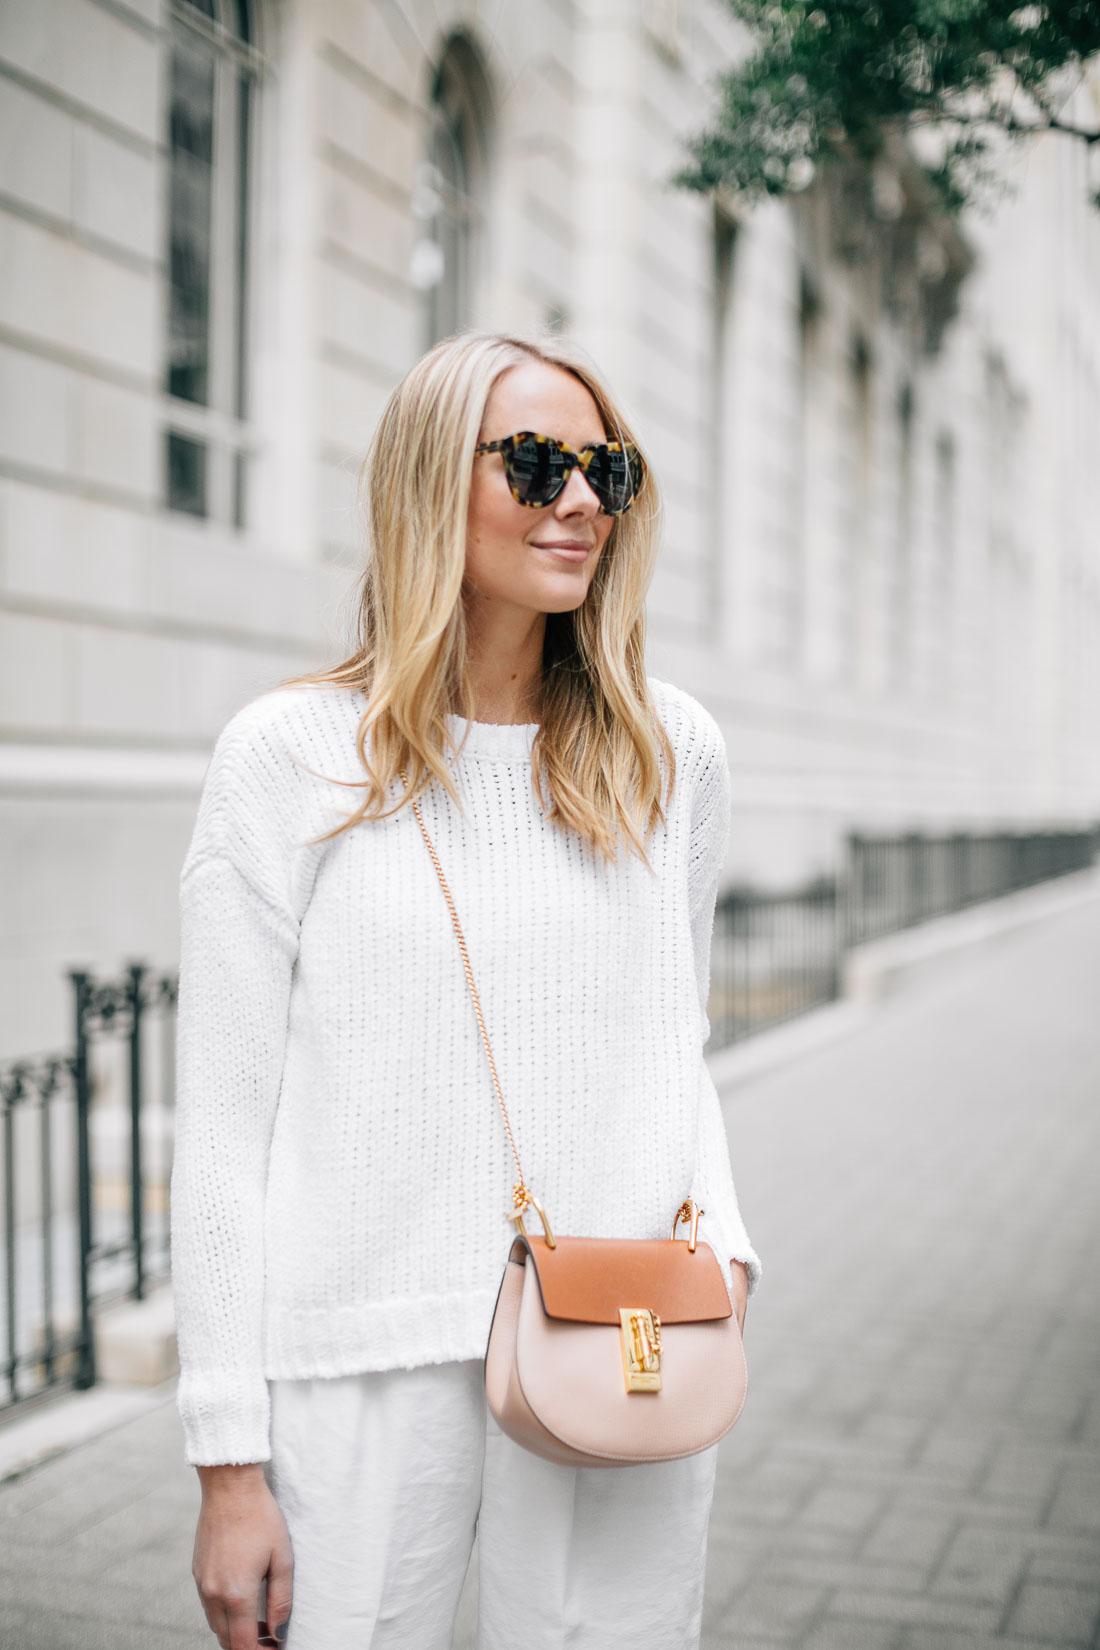 fashion-jackson-tortoise-sunglasses-chloe-drew-handbag-white-sweater